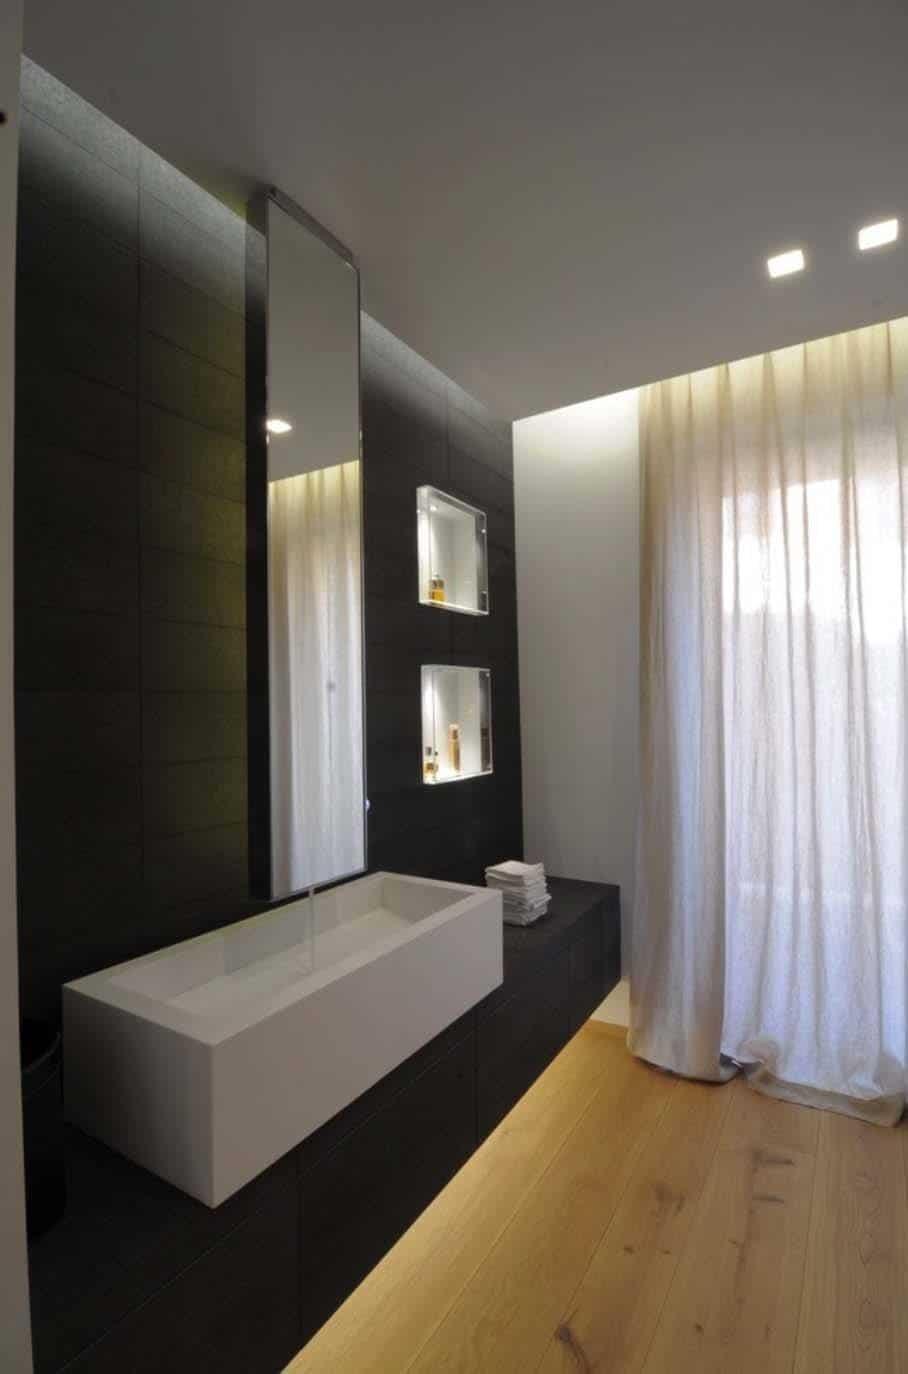 Luxury Home Interior-STIMAMIGLIO-14-1 Kindesign